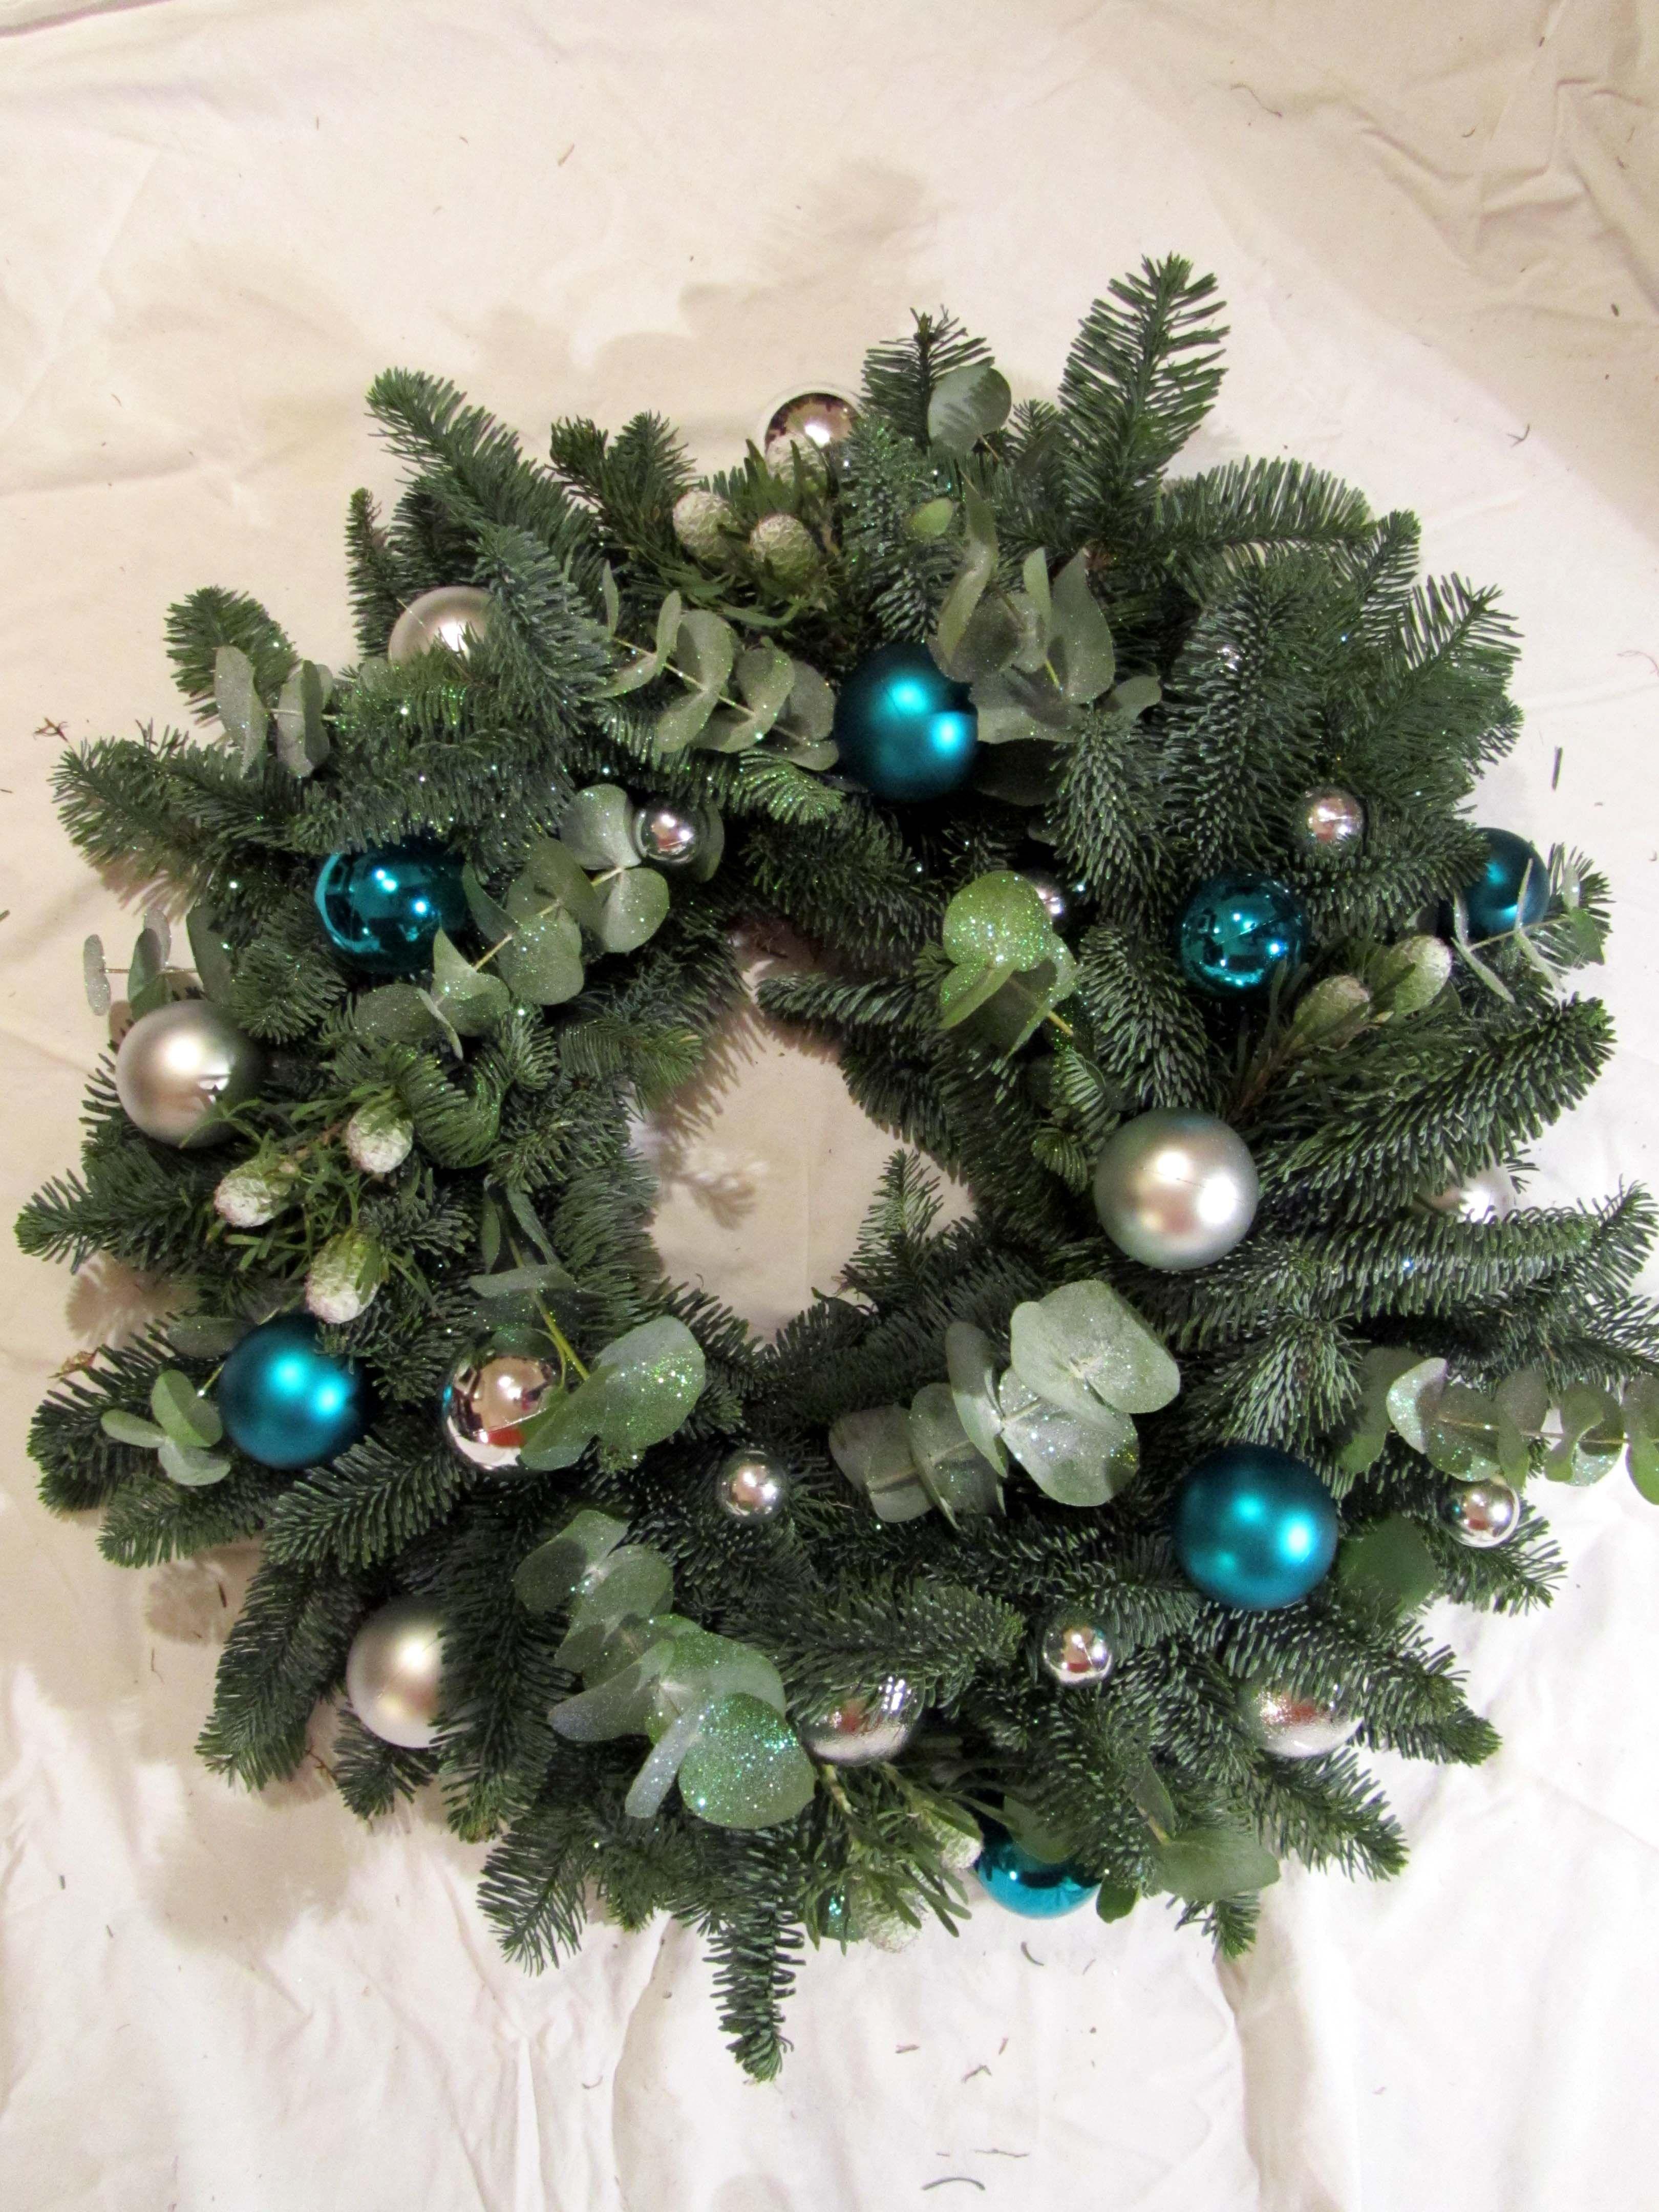 Boutique Blooms Floral Design Blue Fir Eucalyptus Glitter Teal And Silver Ornament Christmas Door W Christmas Door Wreaths Christmas Wreaths Floral Design